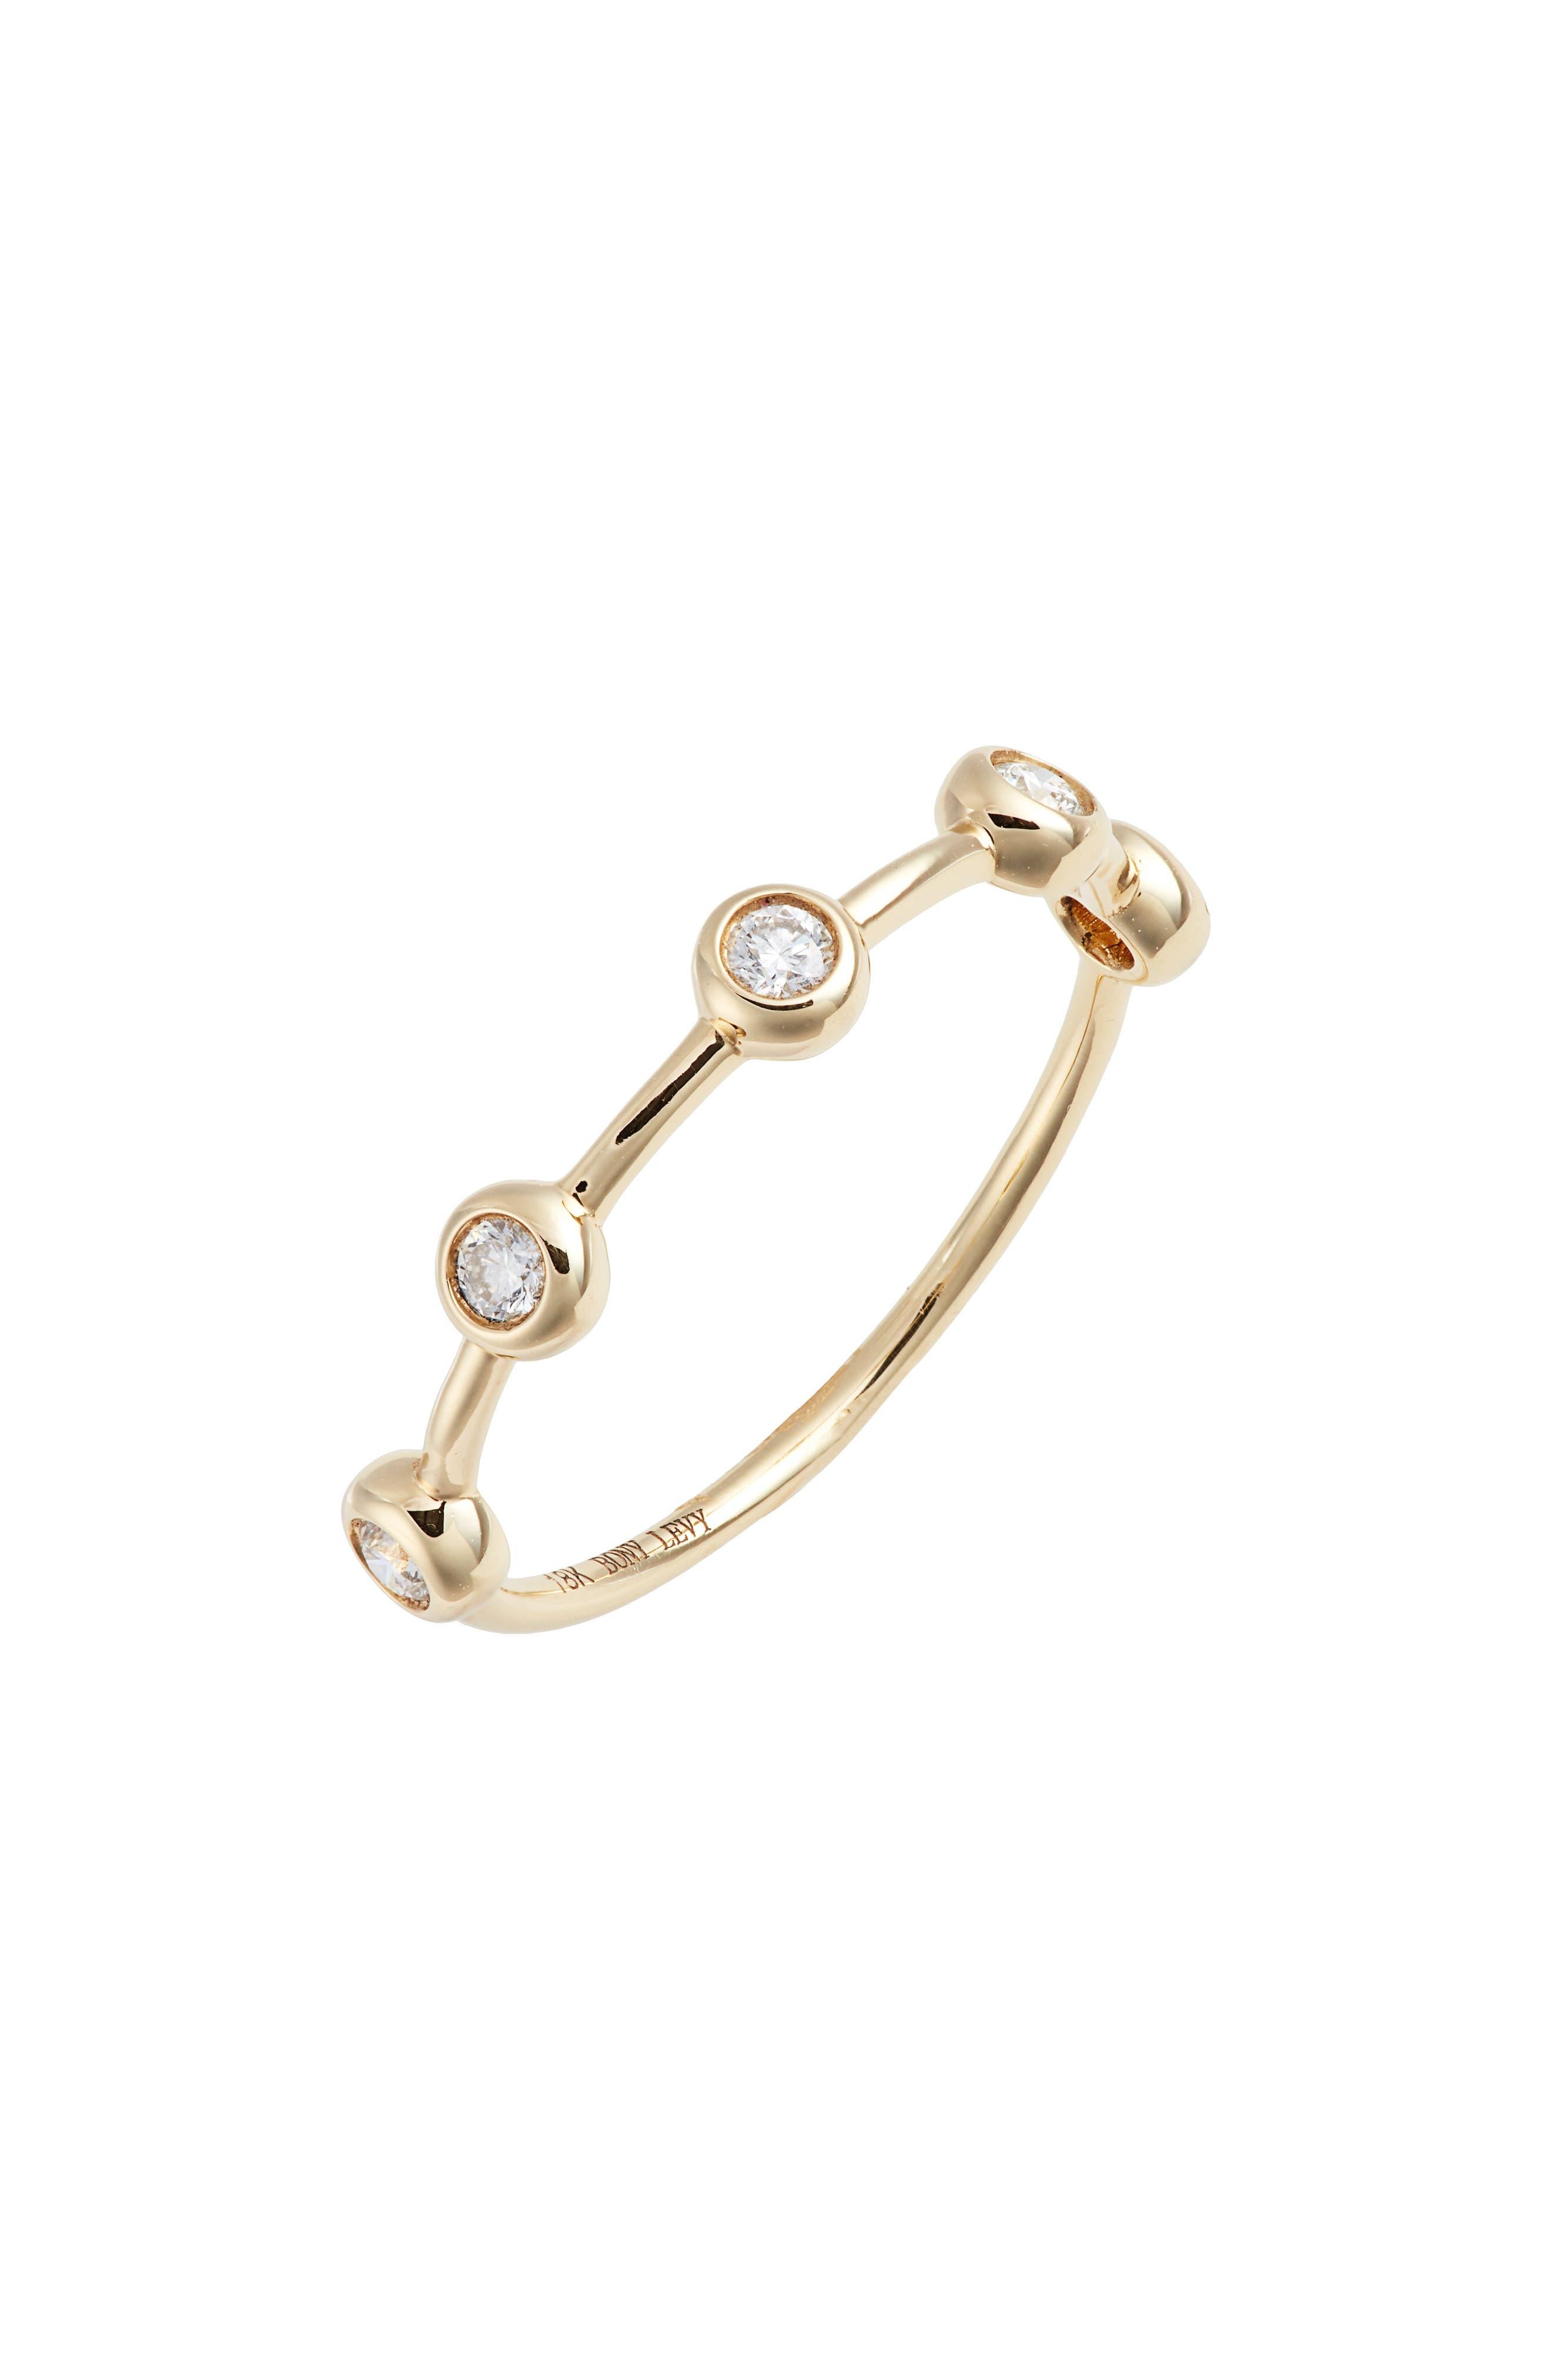 Monaco Bezel Diamond Ring,                         Main,                         color, YELLOW GOLD/ DIA